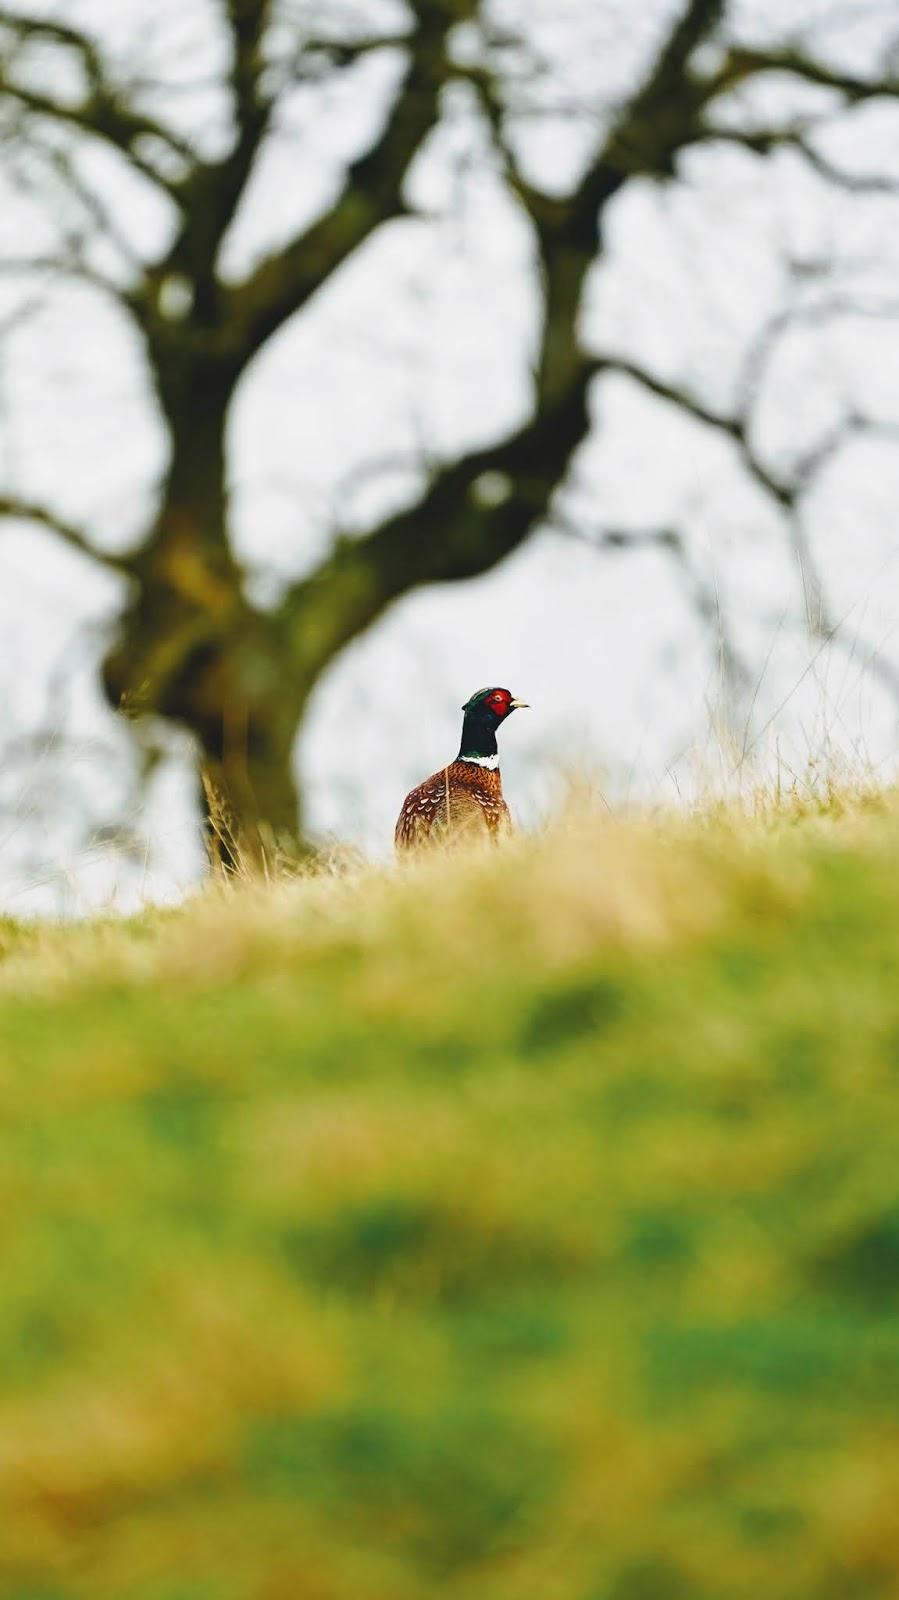 The Golden Pheasant a wonderful golden colors bird